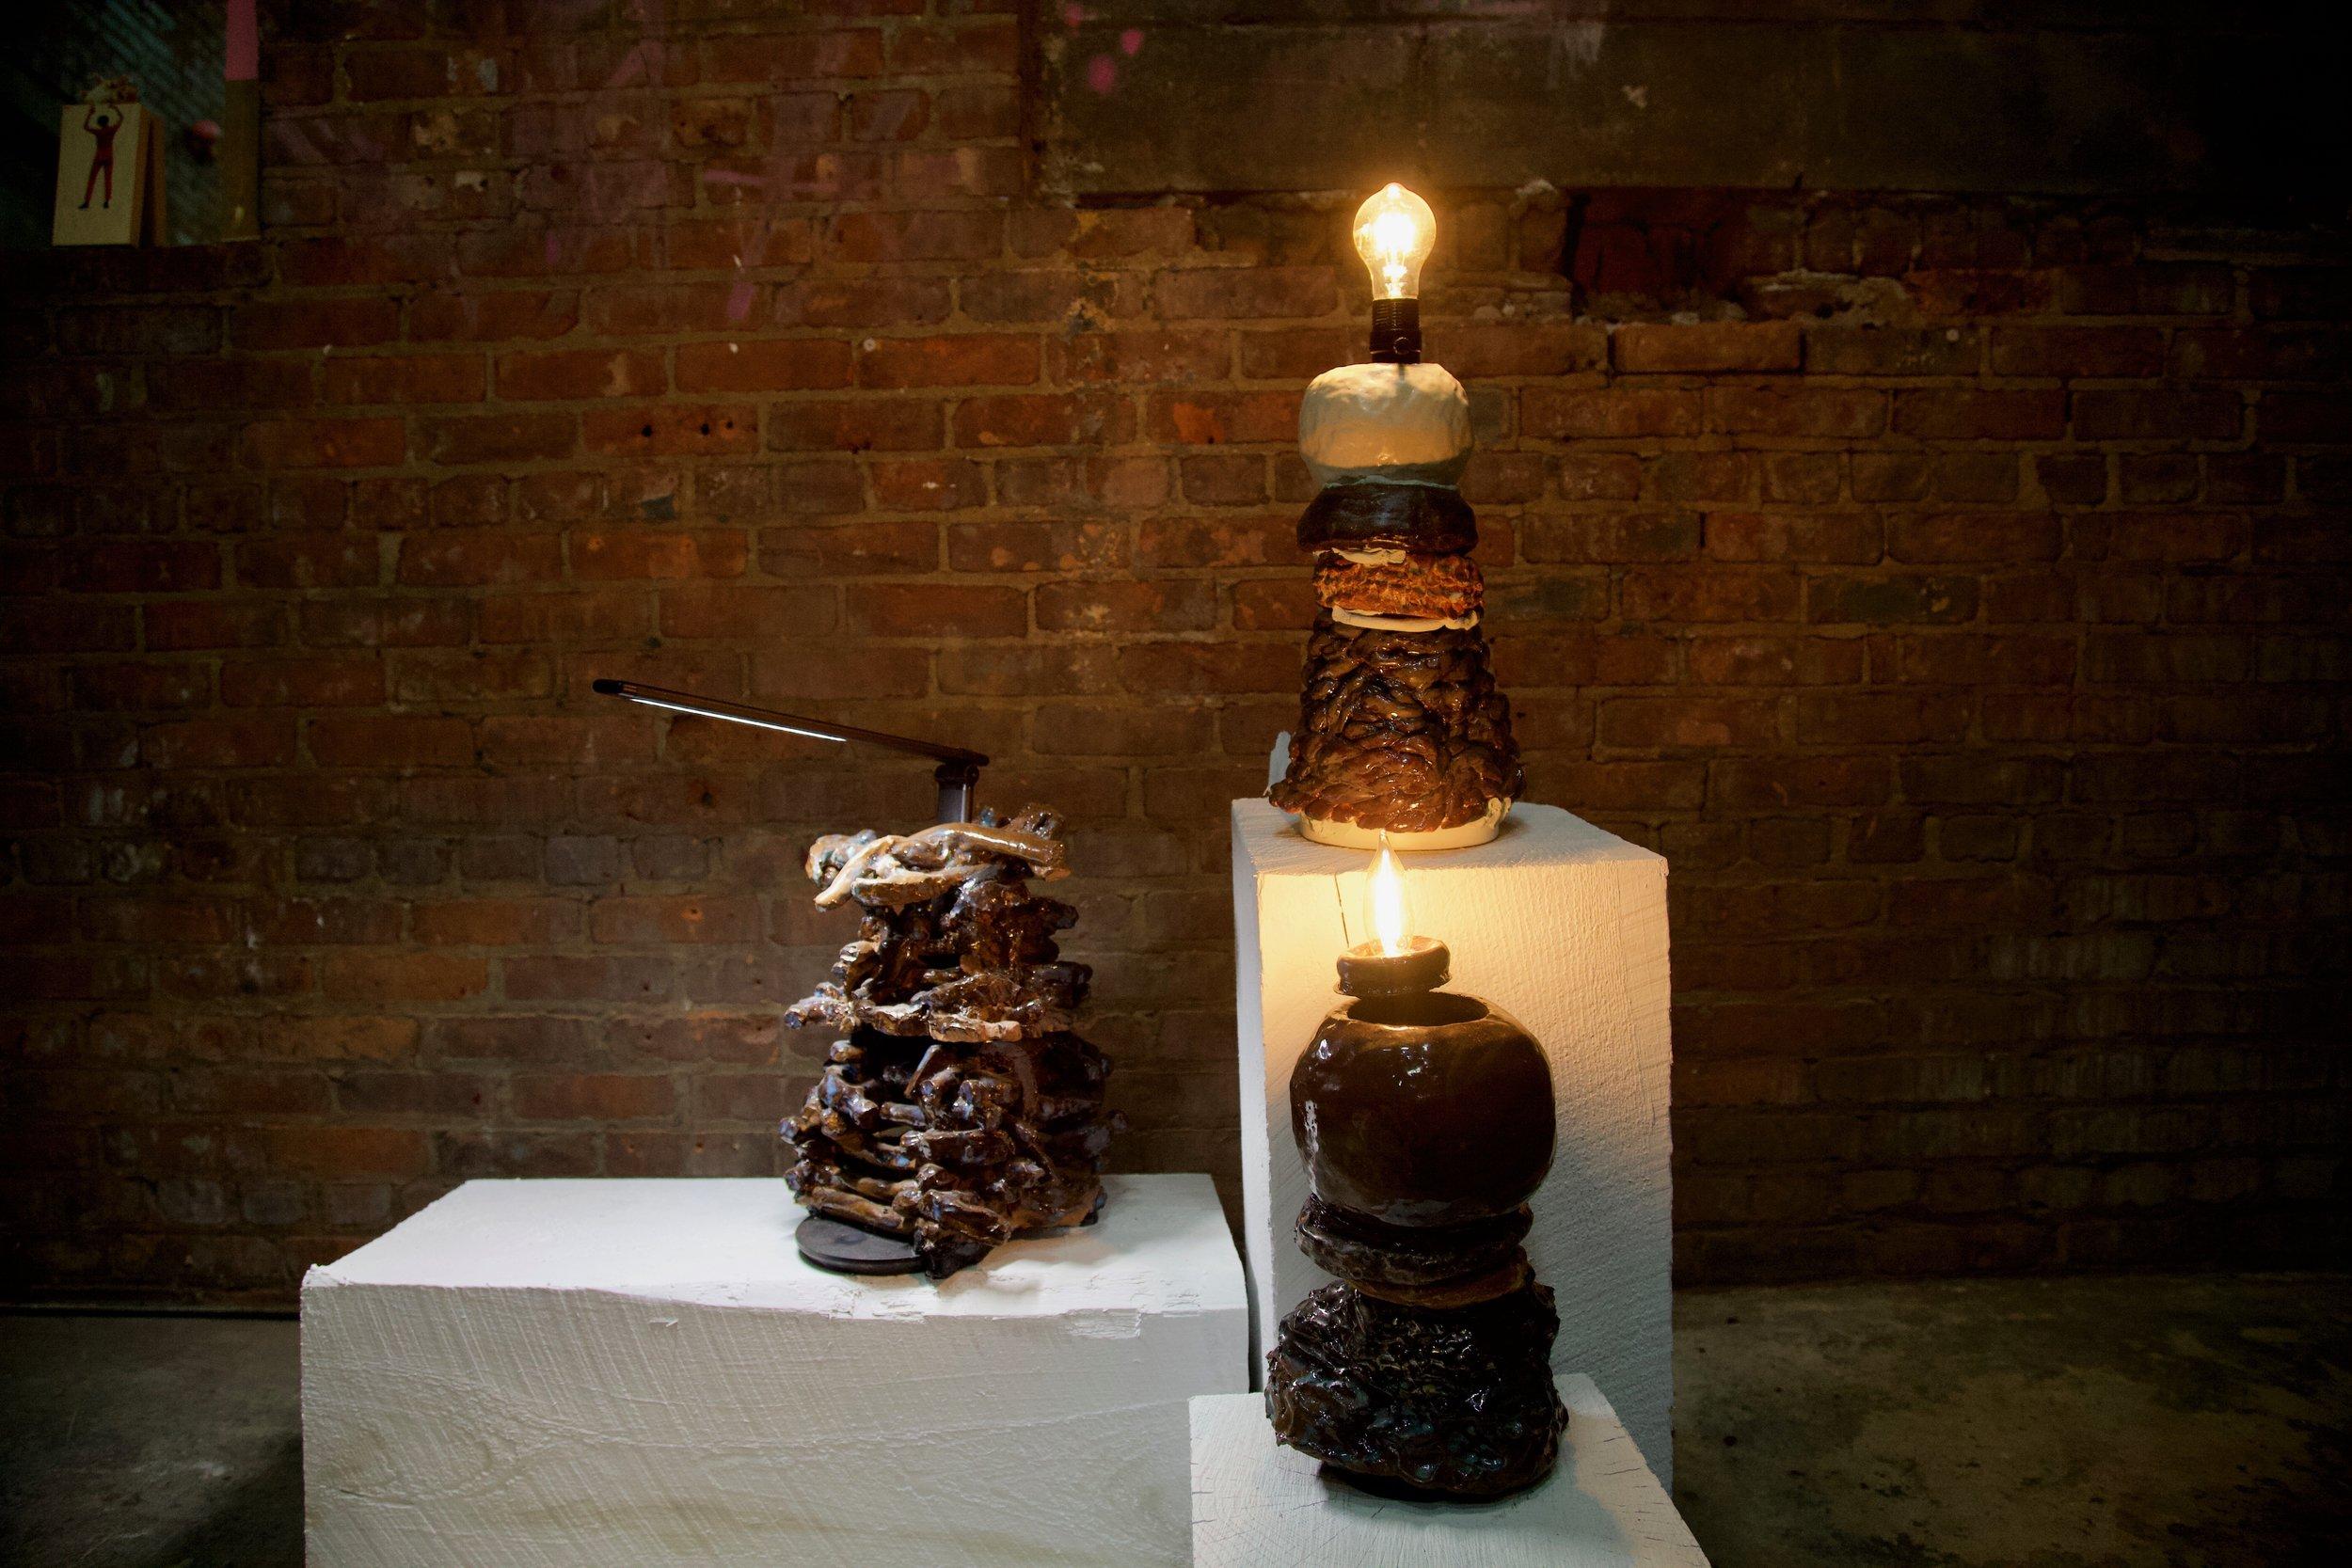 IlanaHarrisBabou_lamps.jpeg